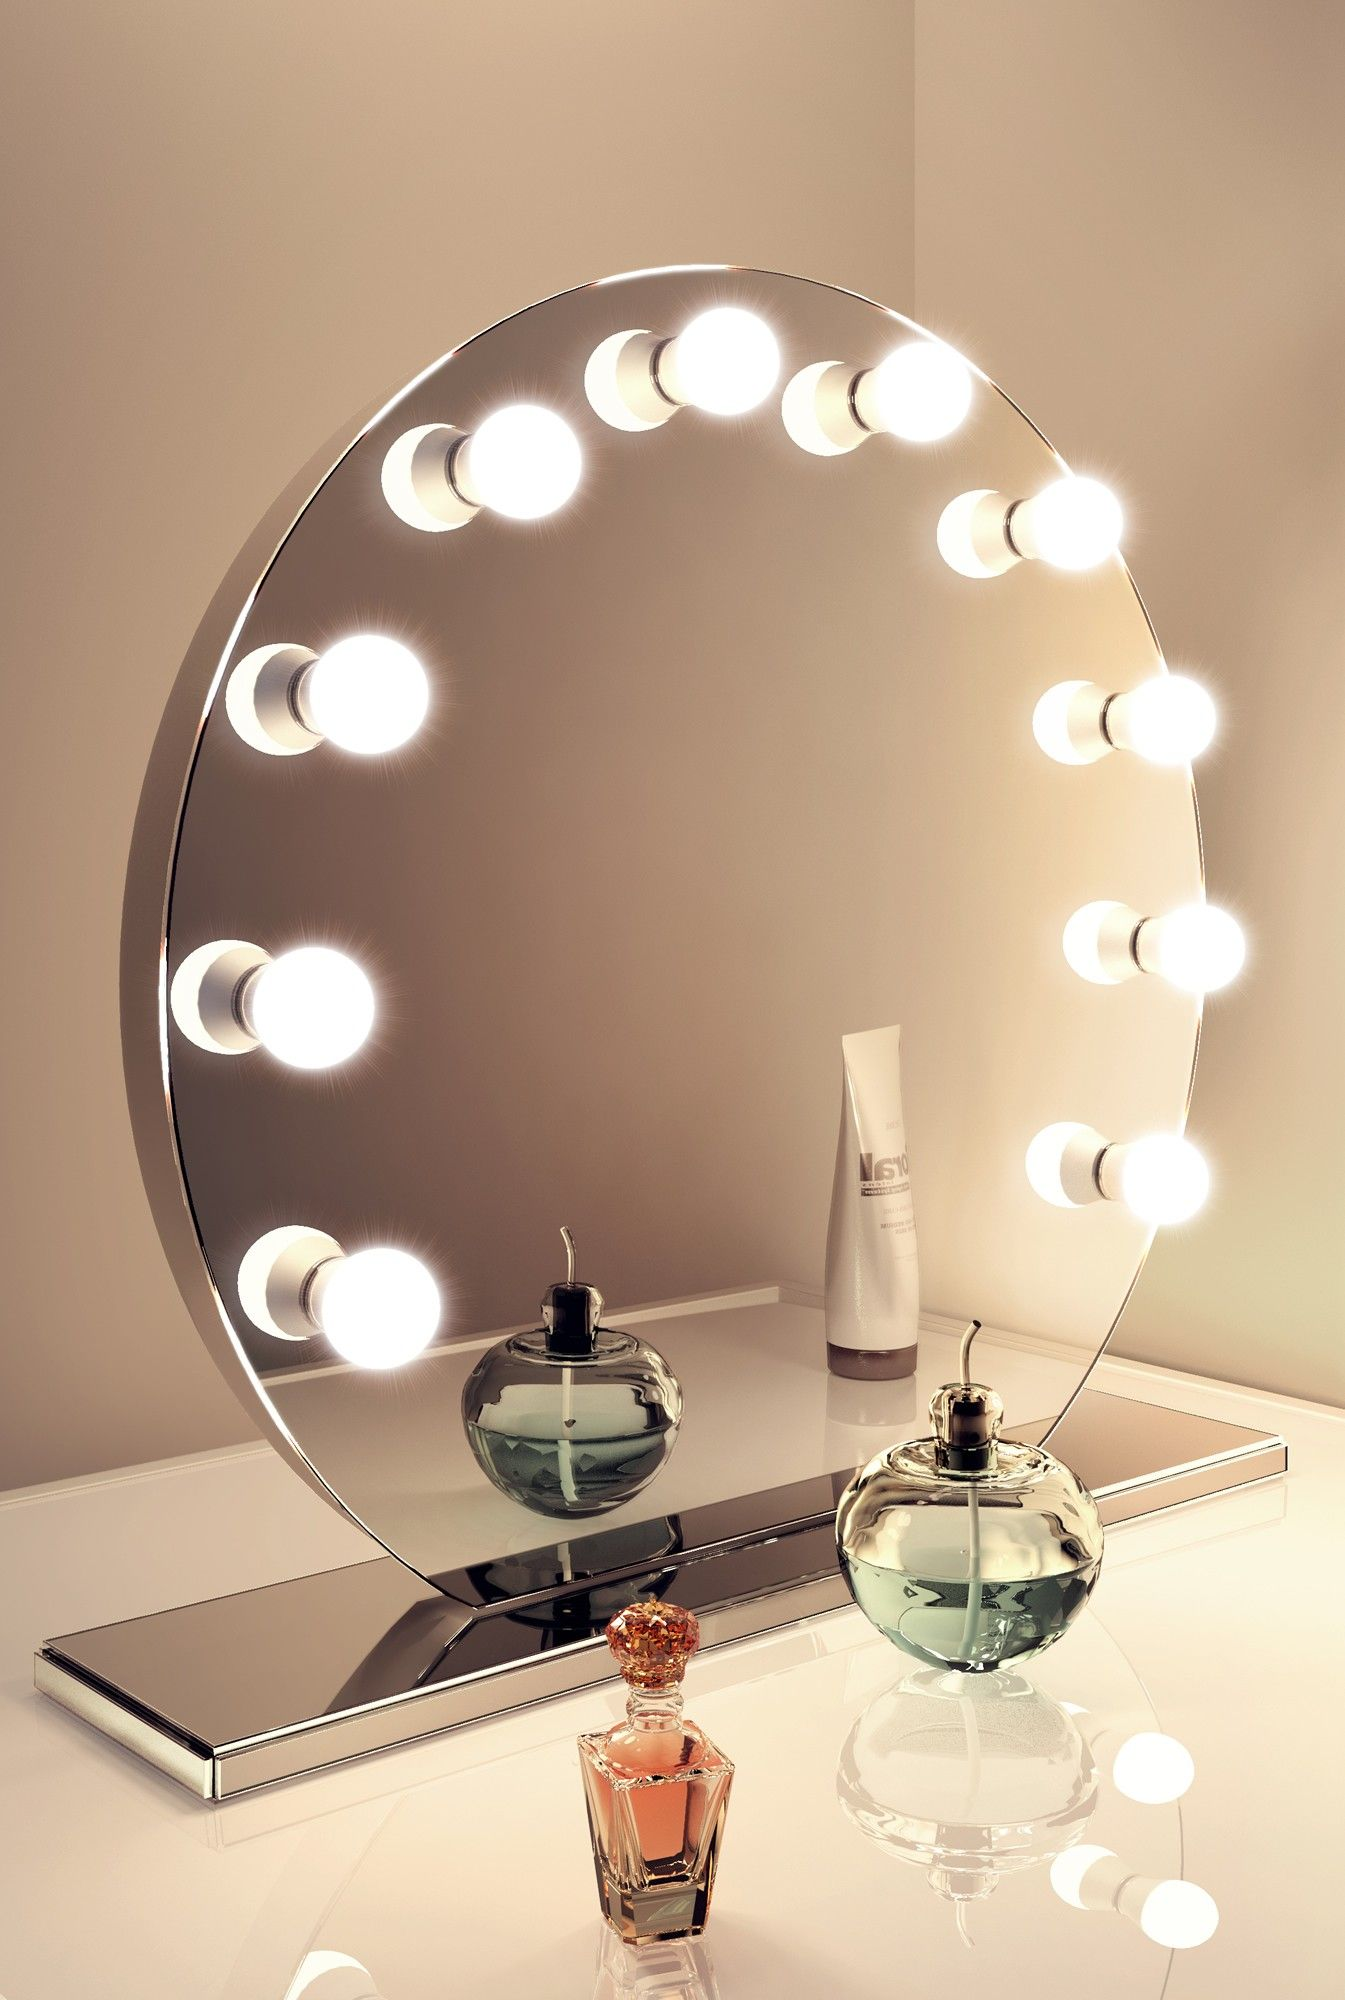 Mirror Finish Hollywood   Table Top   Dia:700mm x Depth:60mm - Illuminated Mirrors